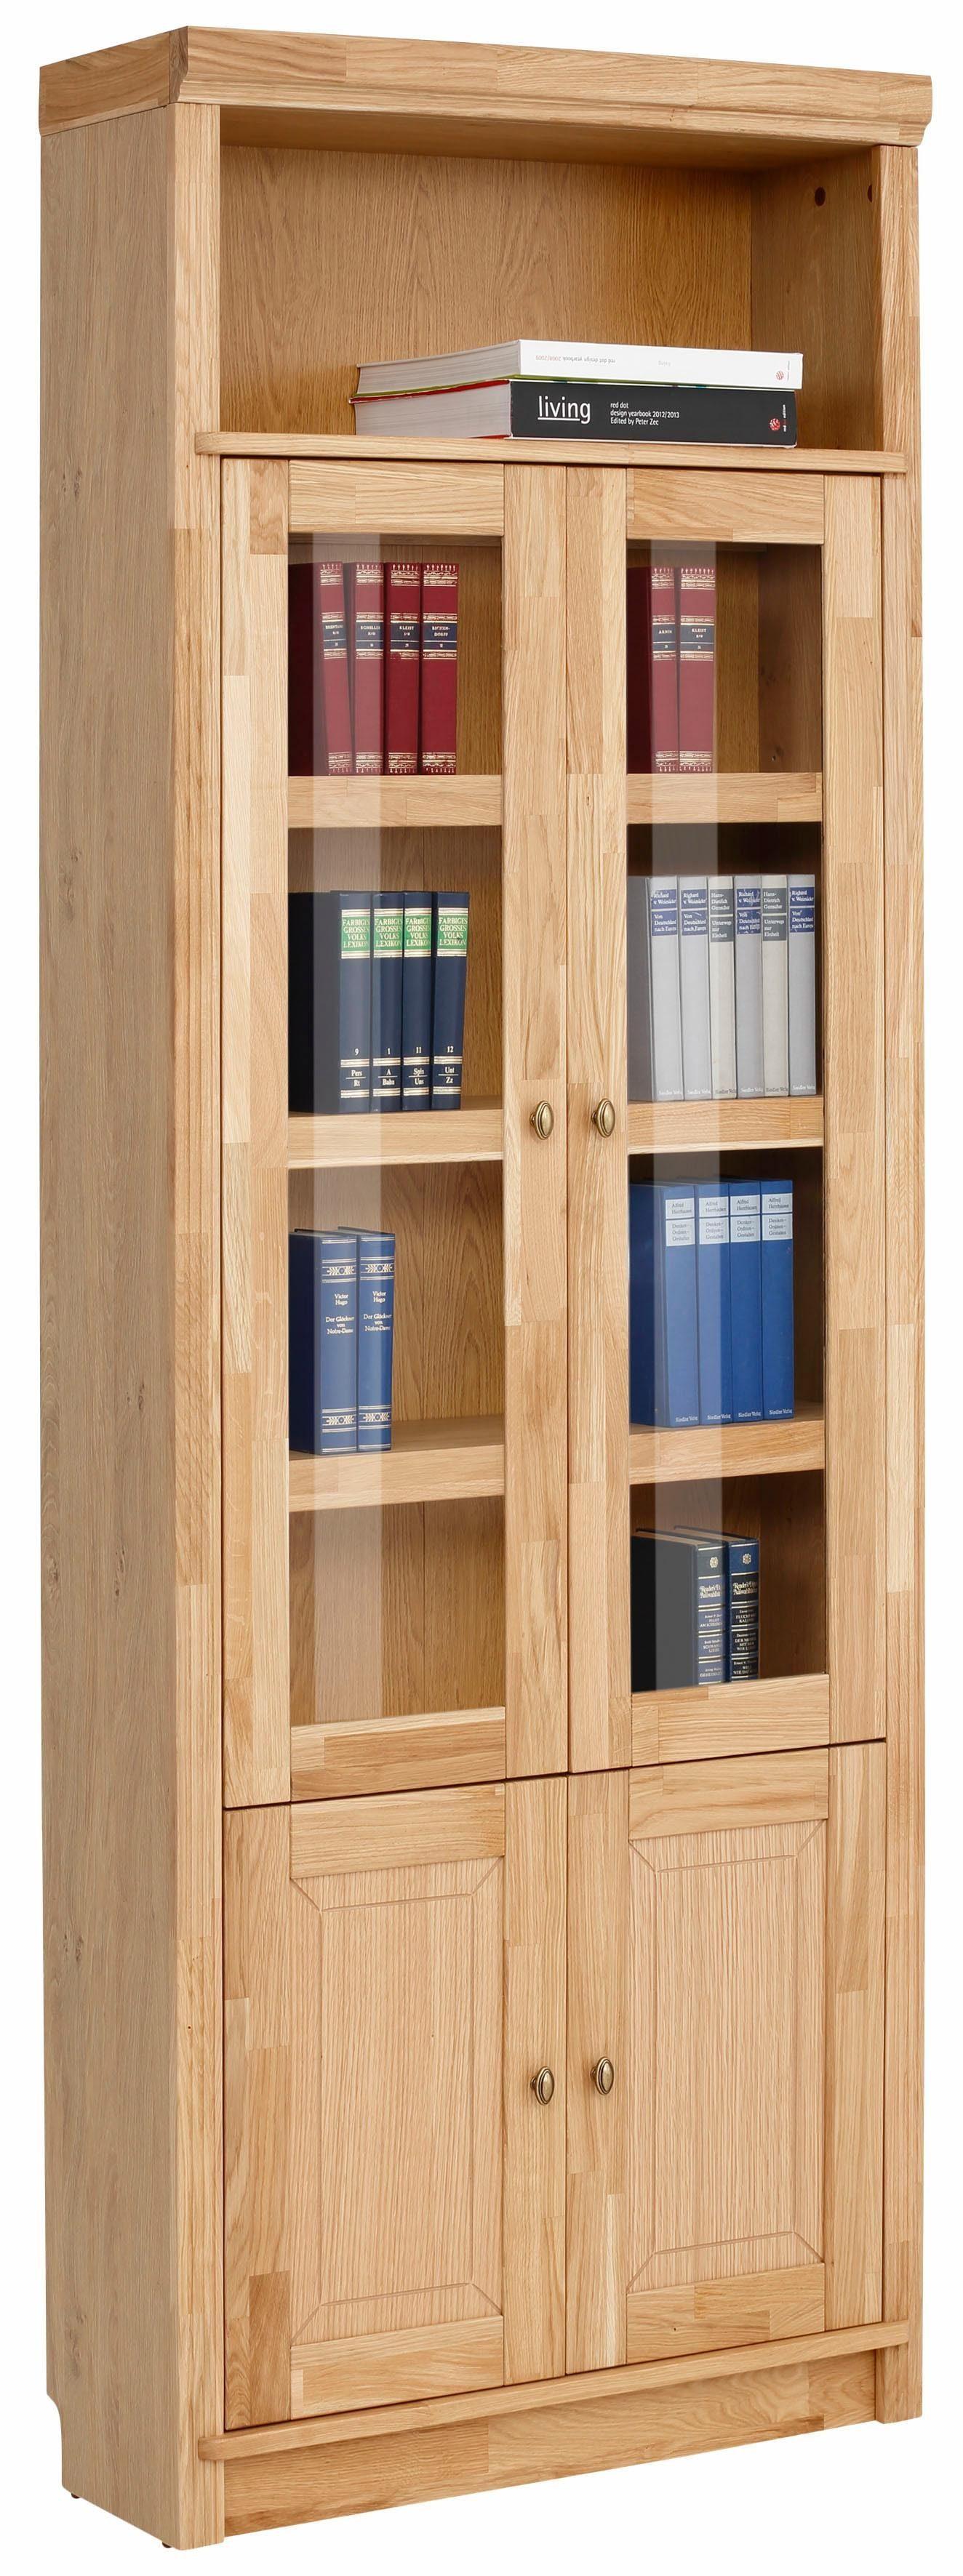 Bücherregal, Home affaire, »Soeren«, in 2 Höhen, Tiefe 29 cm - Home affaire